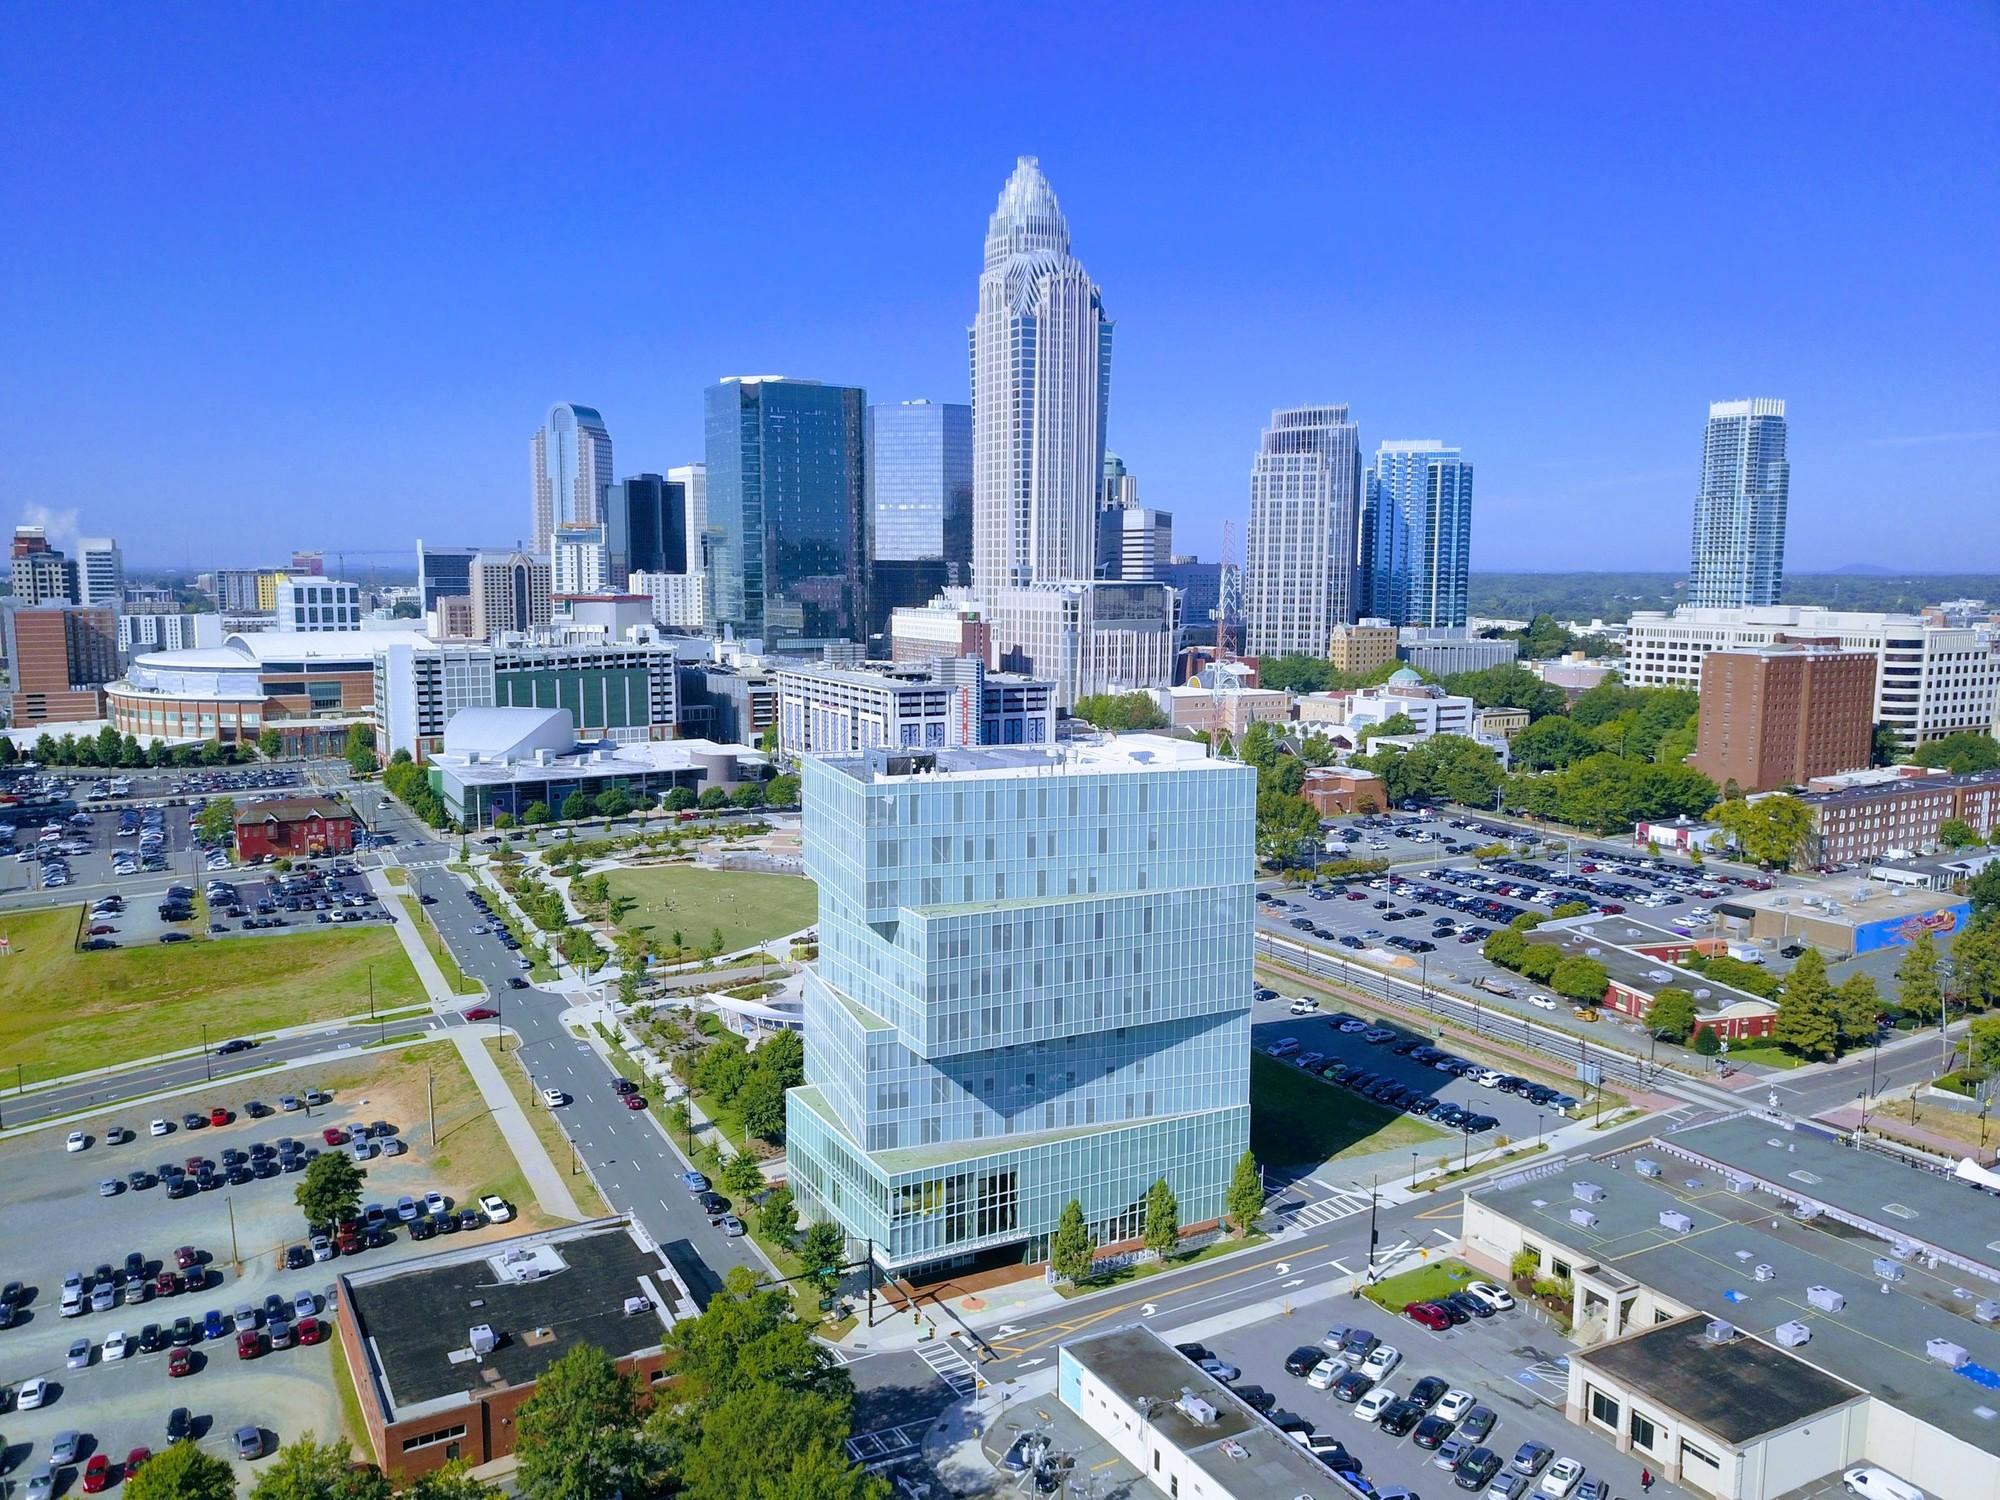 UNC Charlotte City Center Aerial View